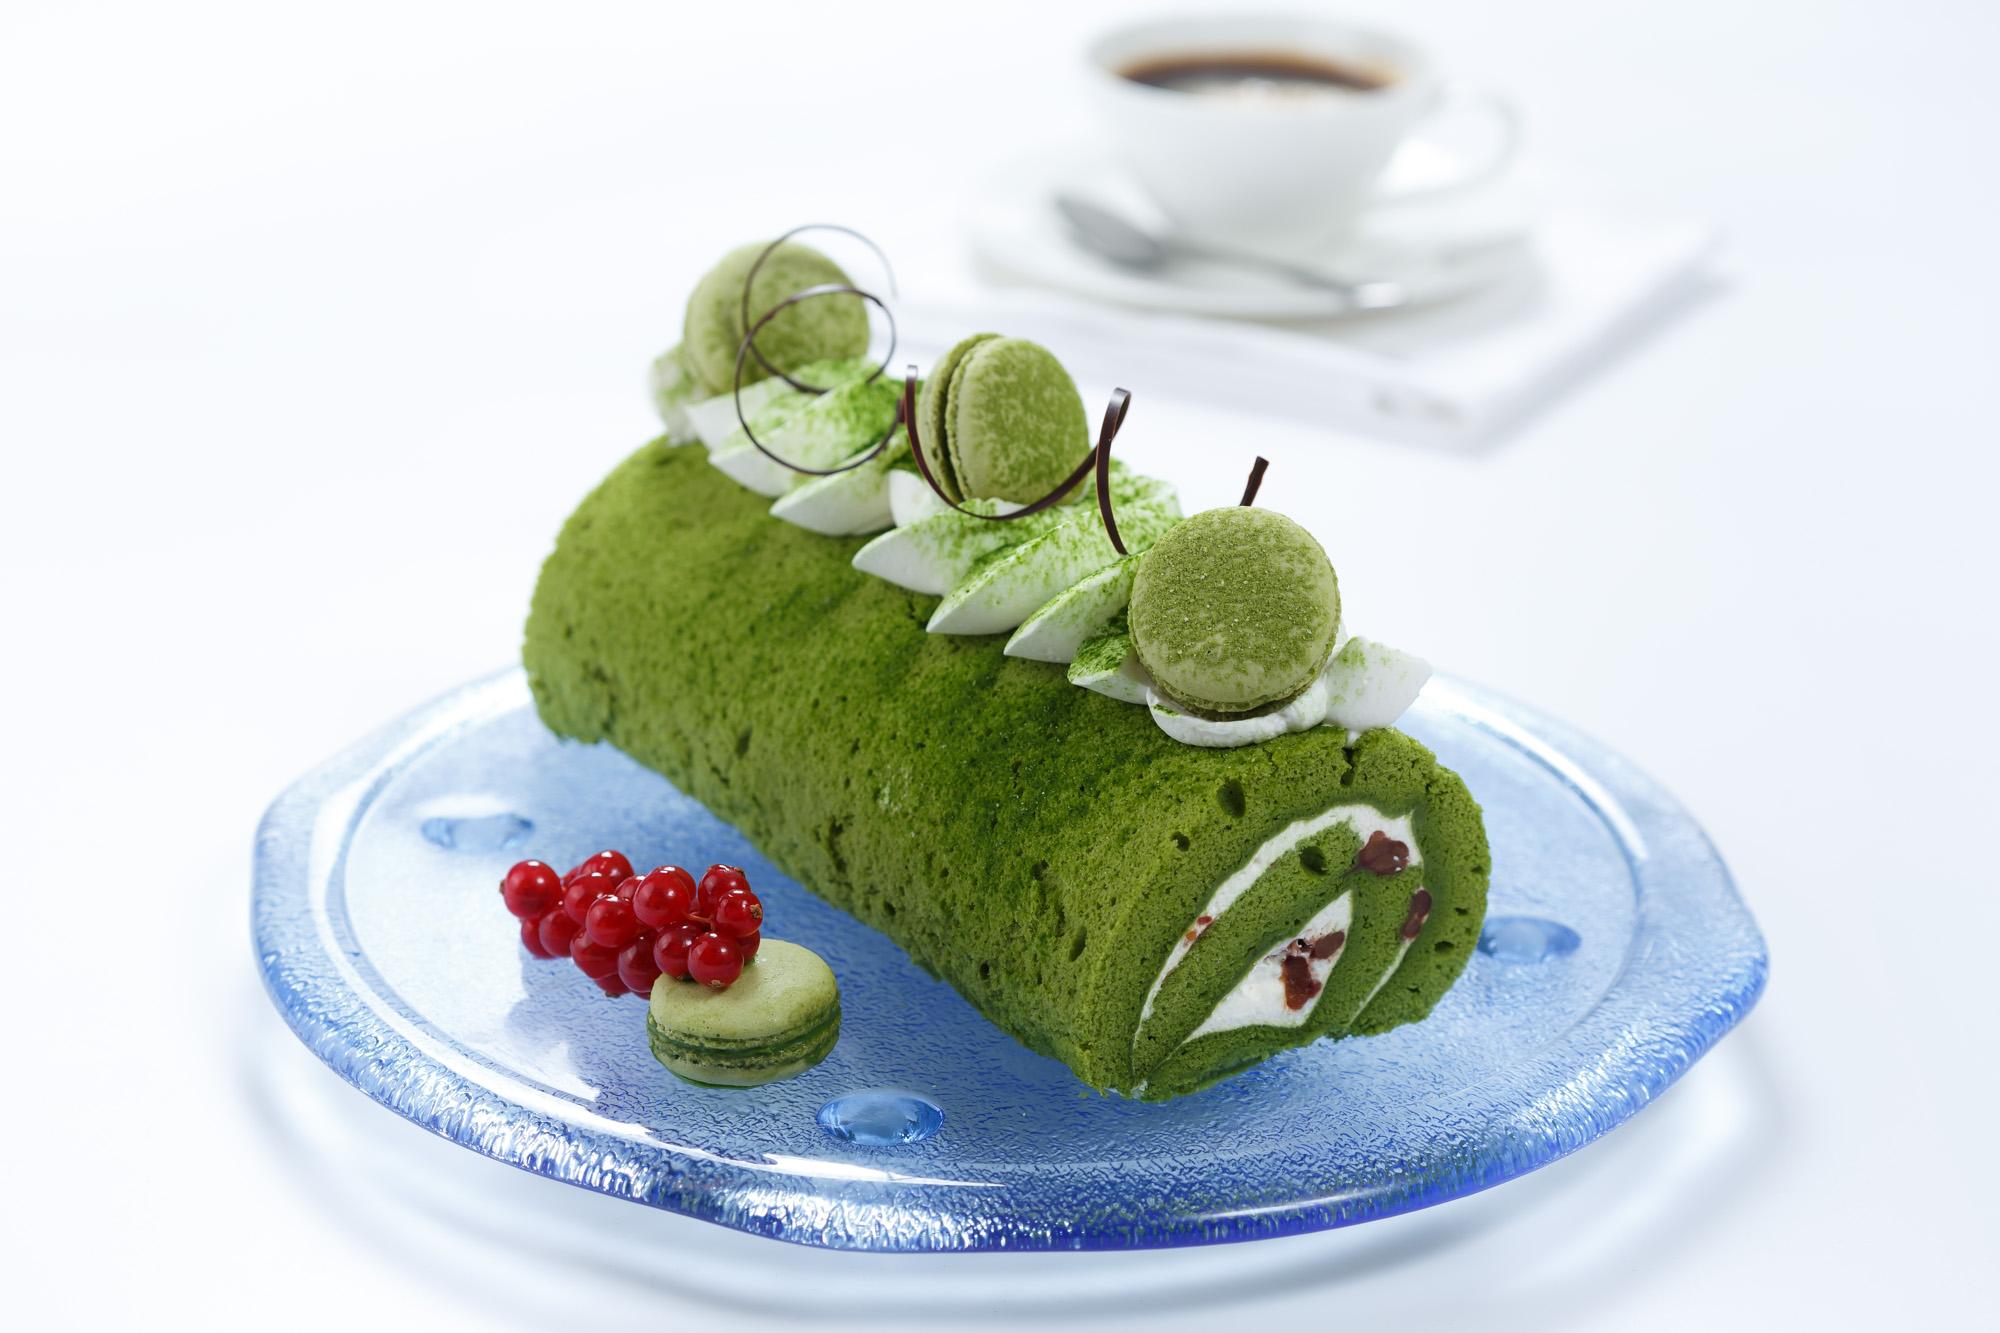 Kowloon Shangri-La, Matcha Green Tea, Deli Kool, Matcha Swiss Roll, Roll Cake